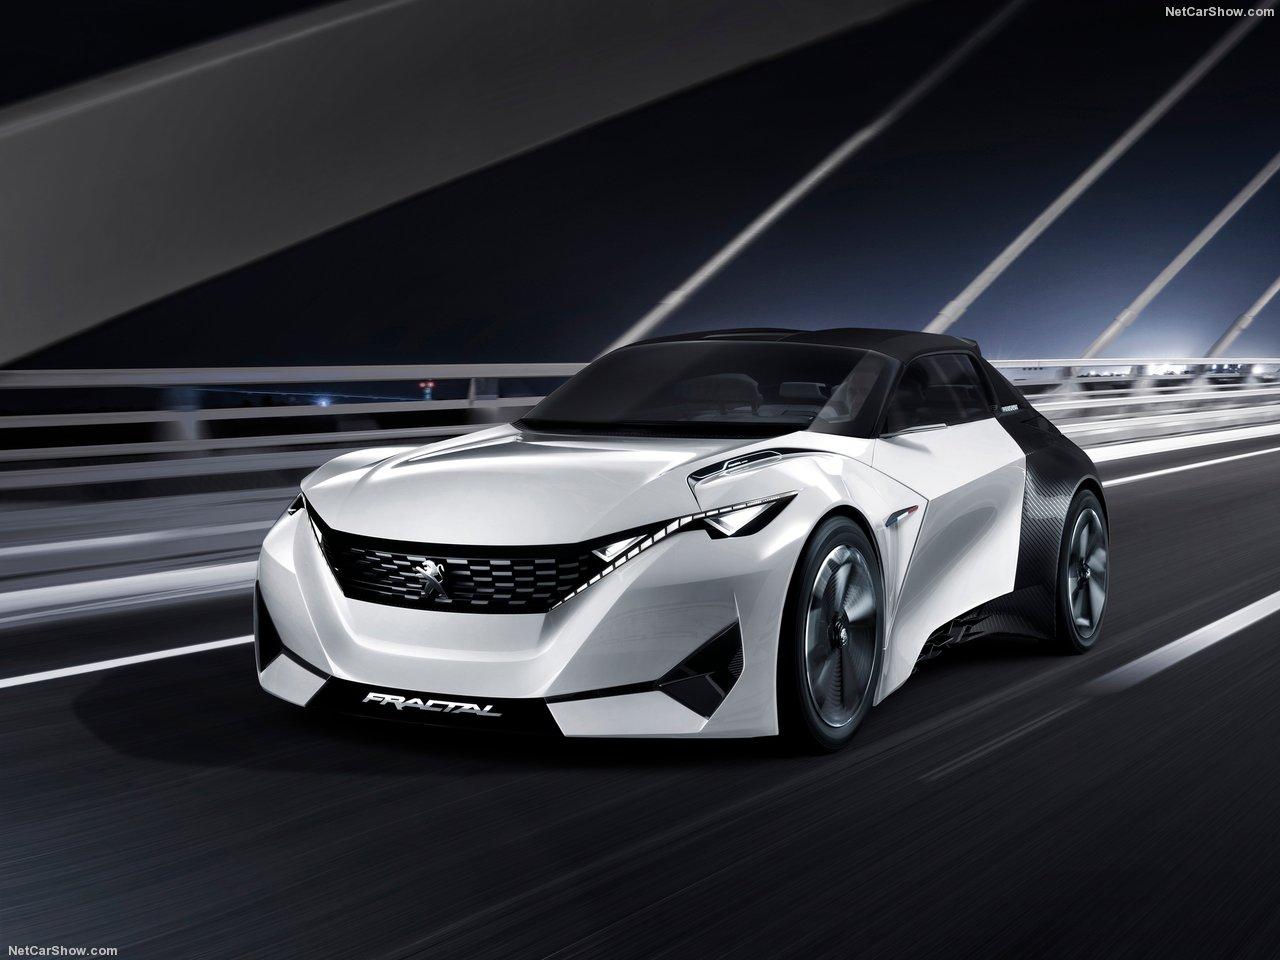 Peugeot-Fractal_Concept_2015_1280x960_wallpaper_01